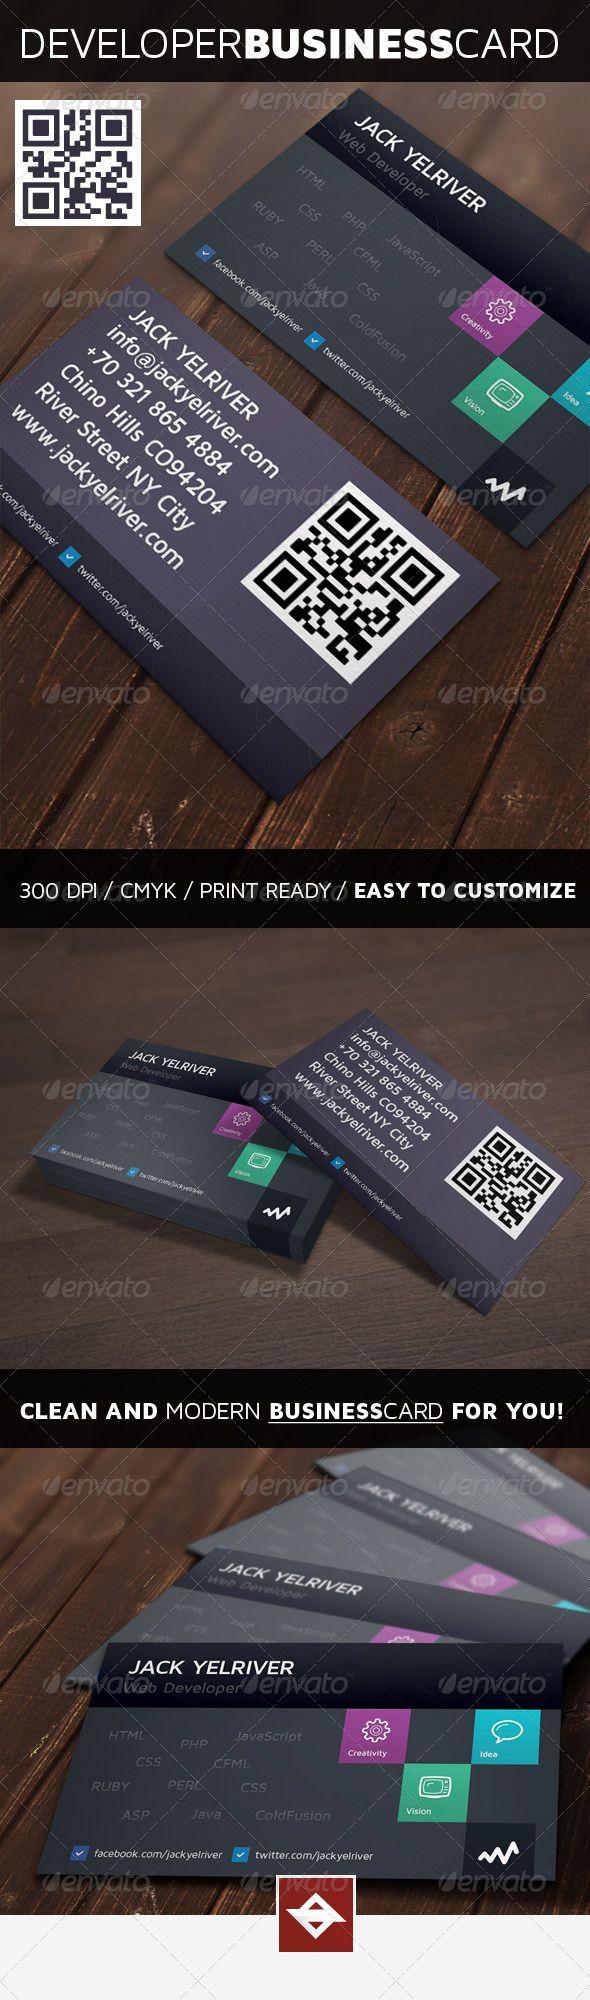 The 25+ best Business card software ideas on Pinterest | Business ...